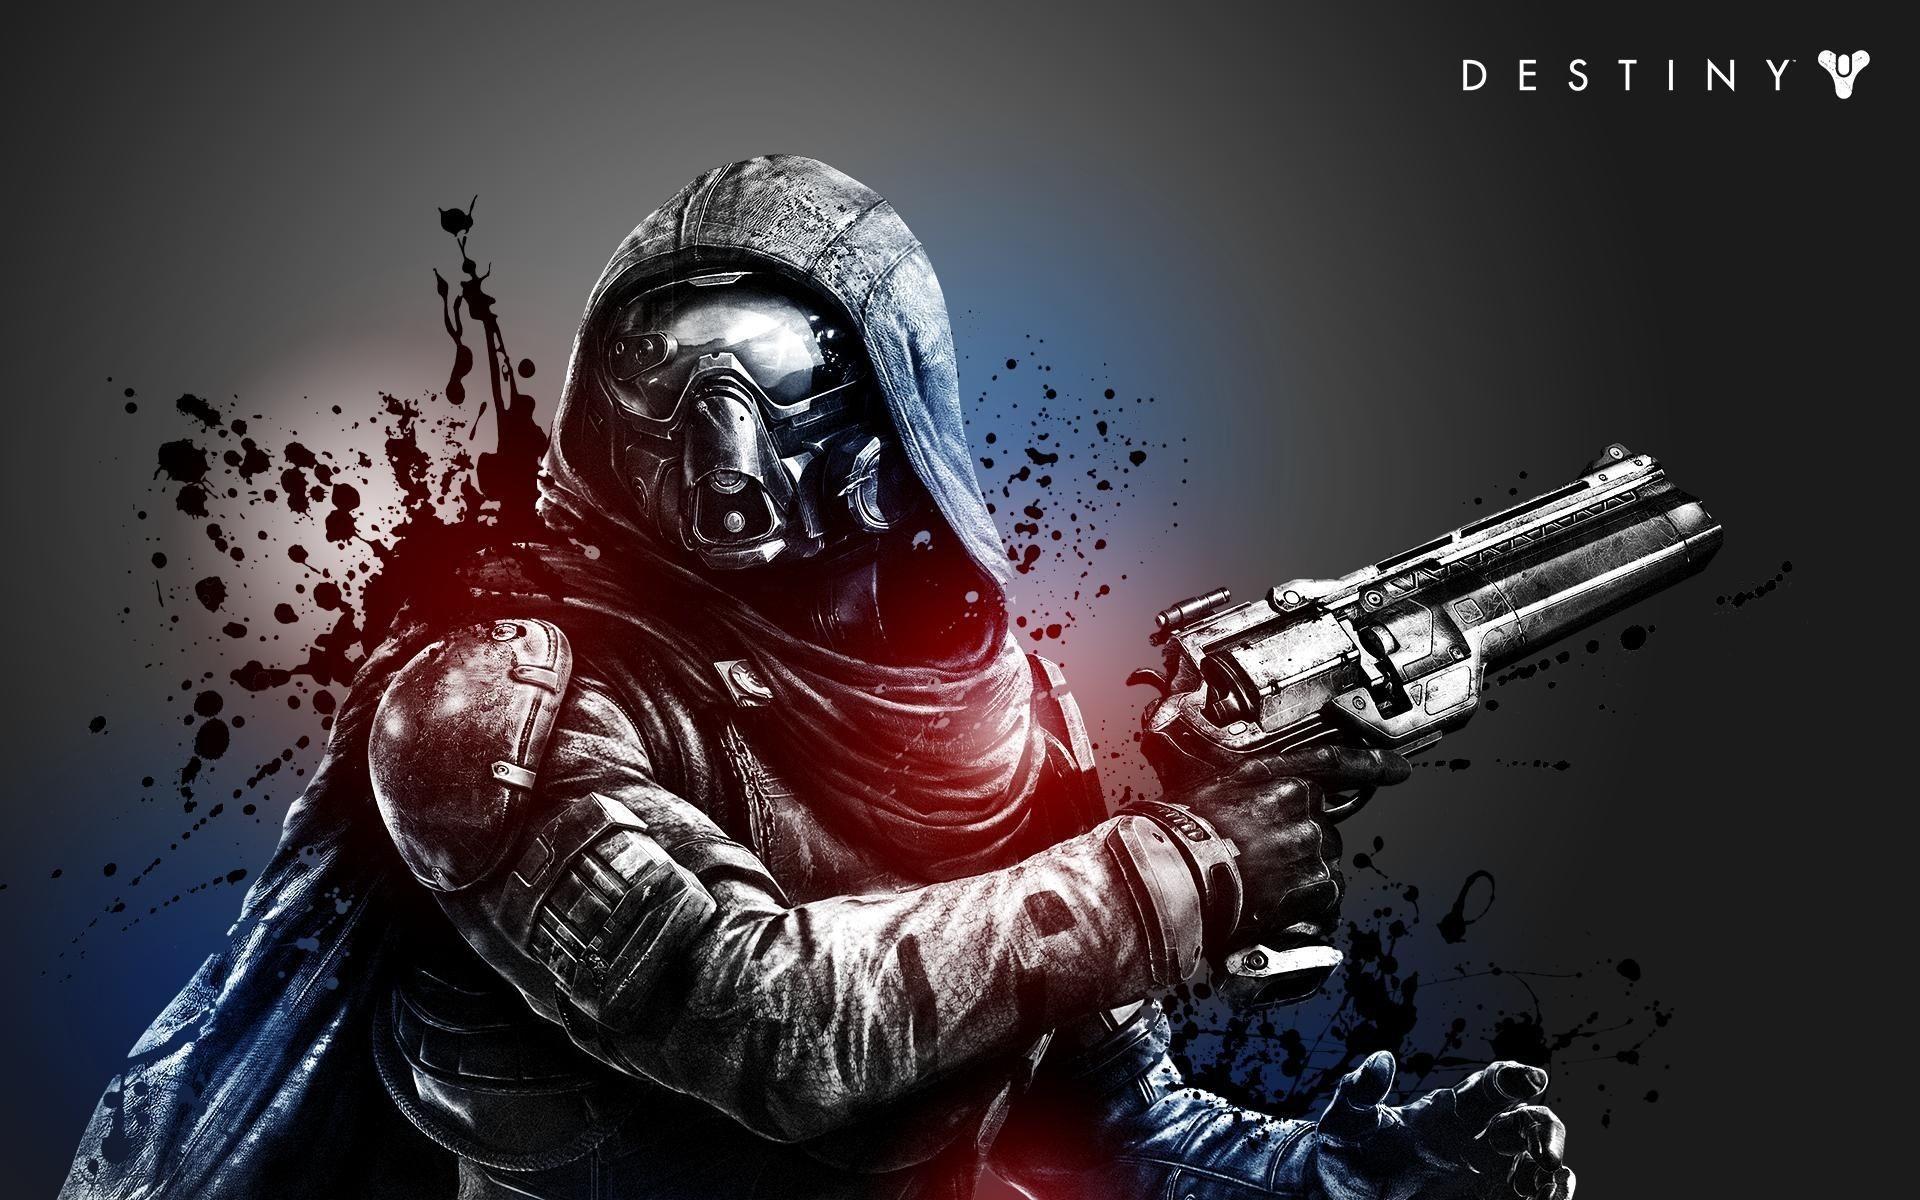 73 Destiny Hunter Wallpapers On Wallpaperplay Destiny Hunter Destiny Wallpaper Hd Destiny Backgrounds